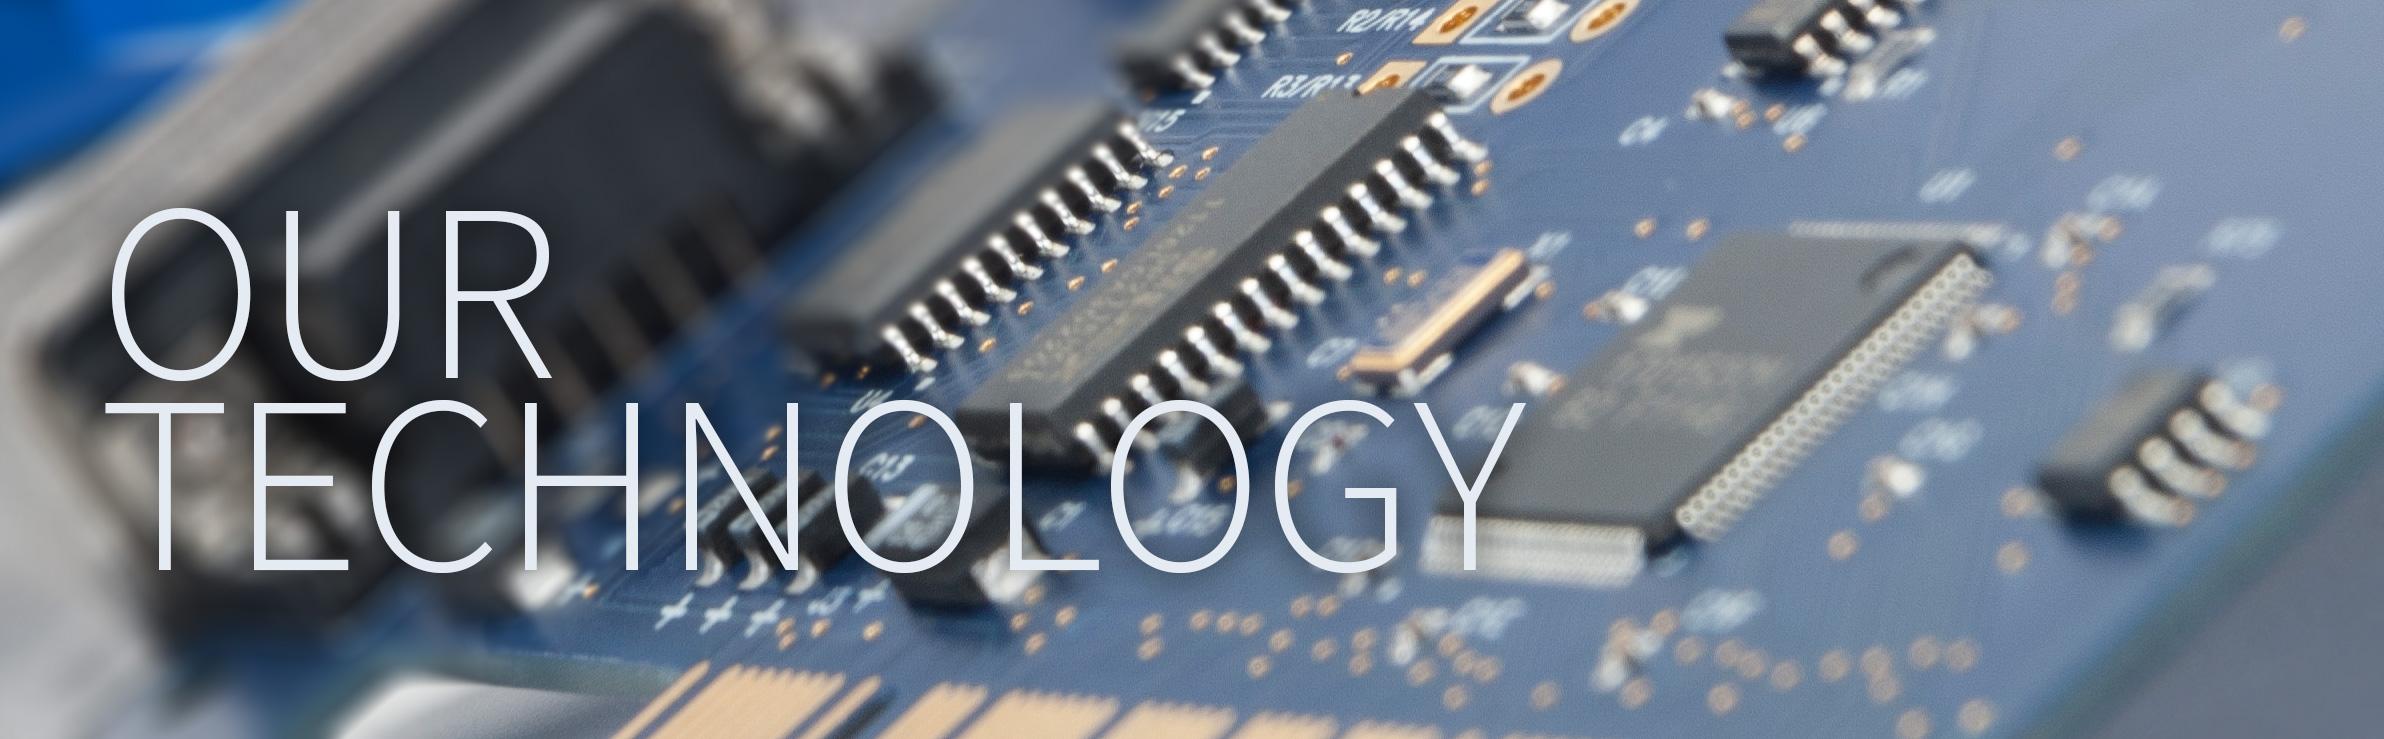 B+B Technology